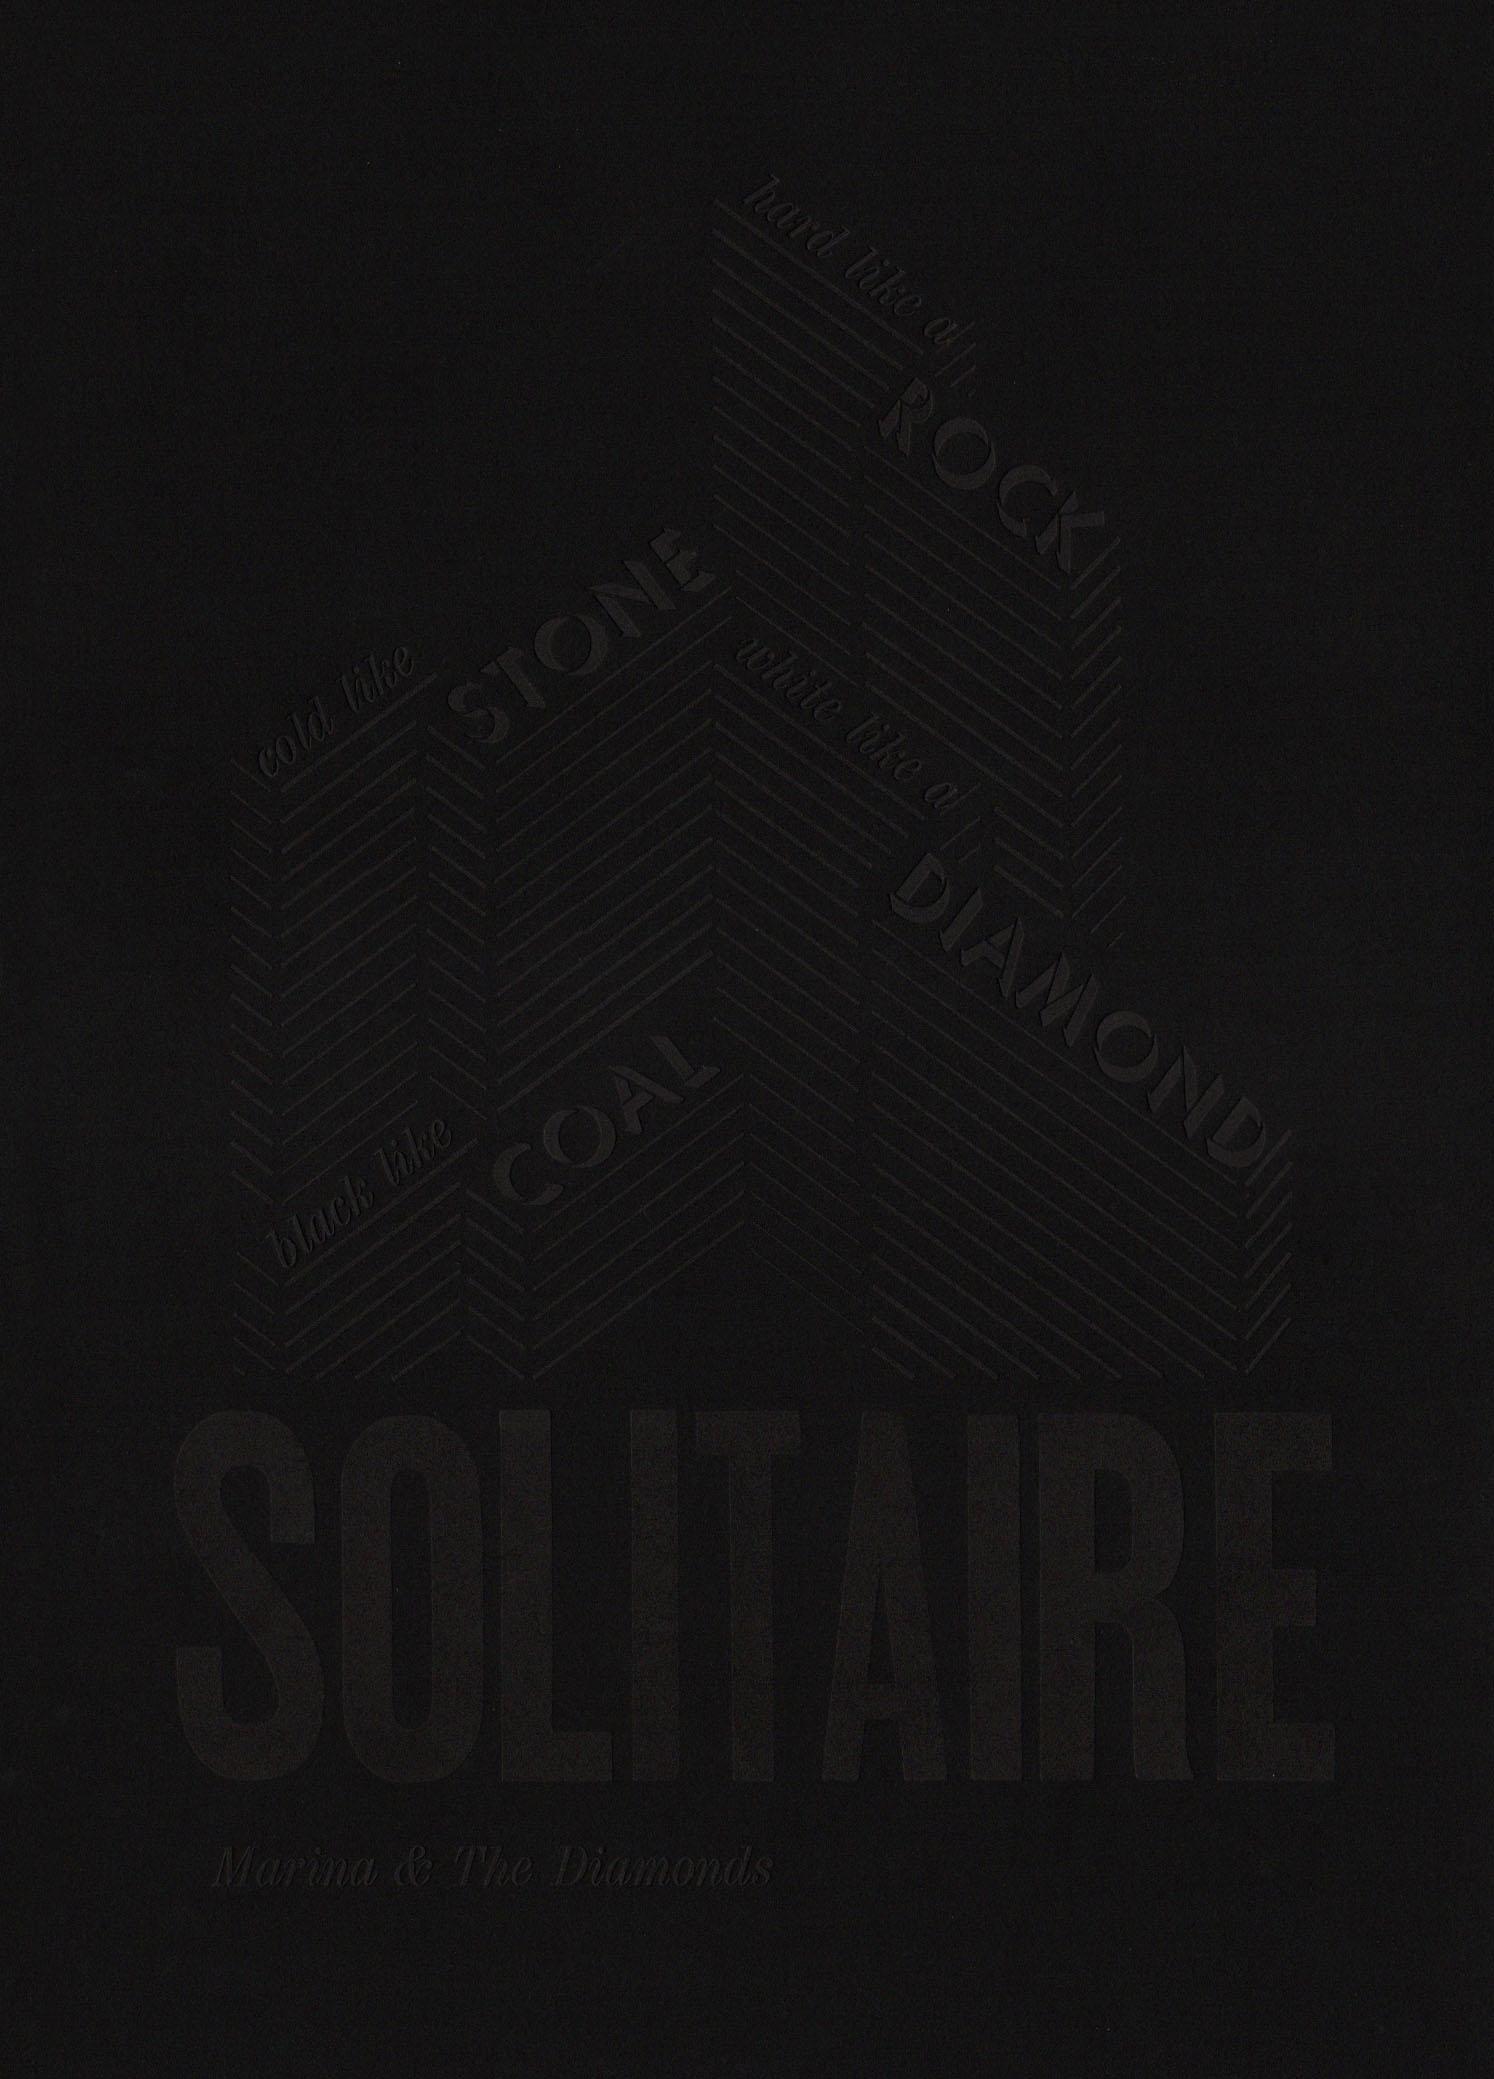 solitaire.jpg